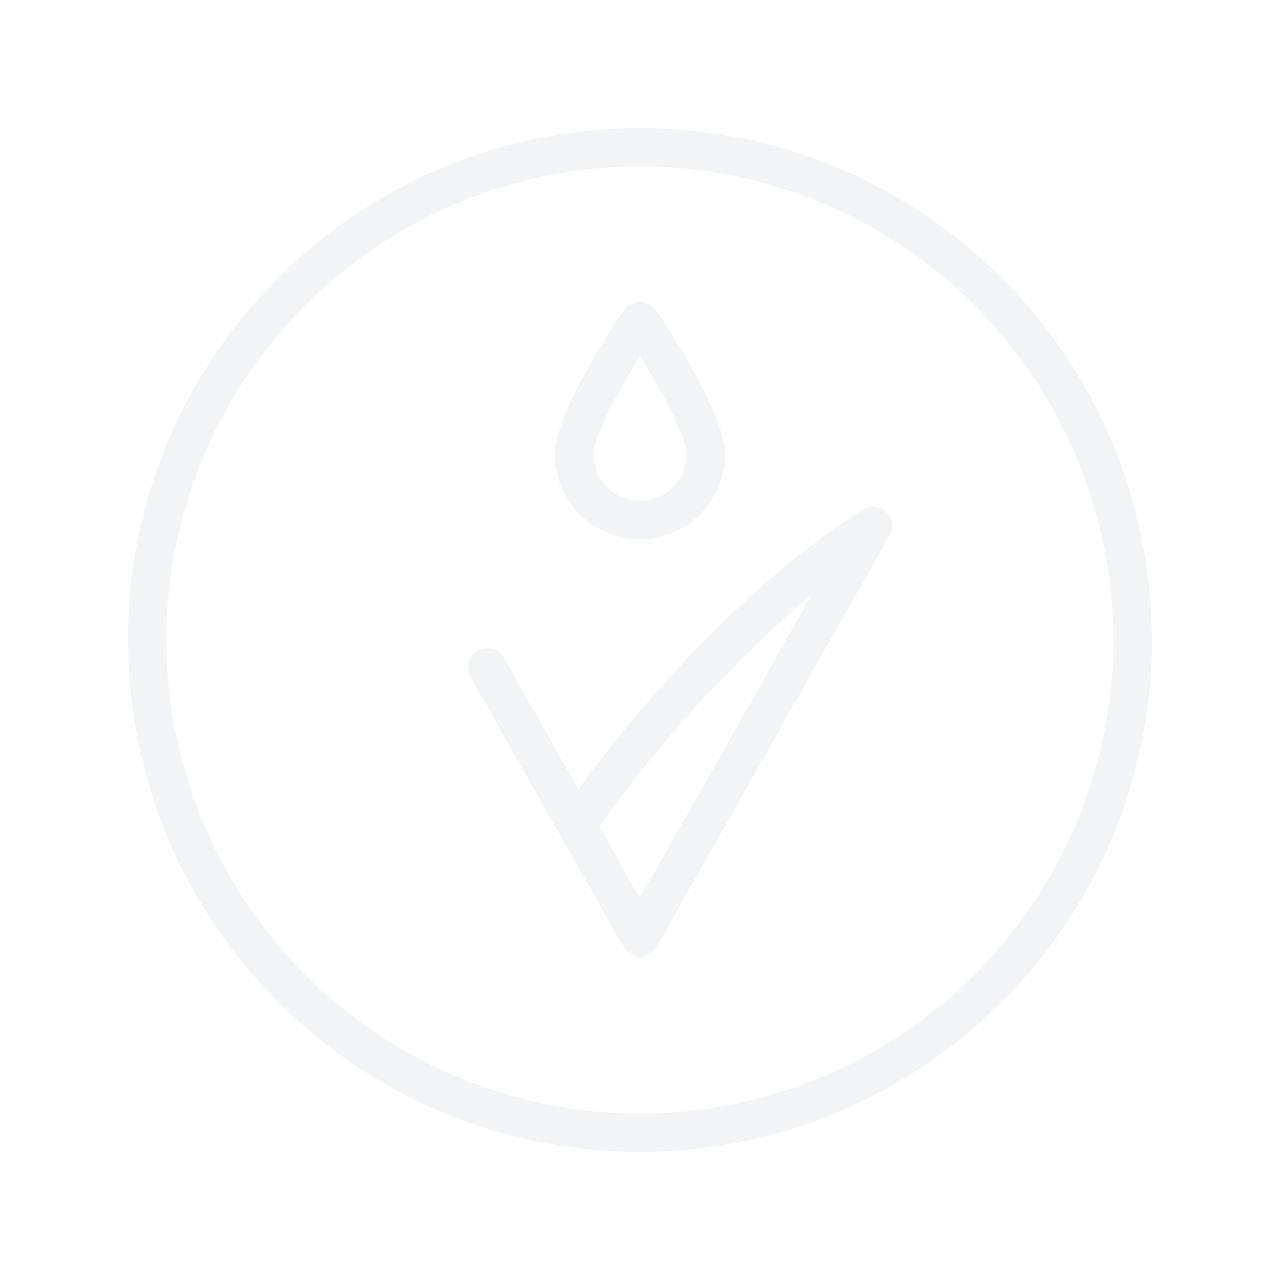 DR. BRONNERS Tea Tree Pure Castile Soap Bar 140g